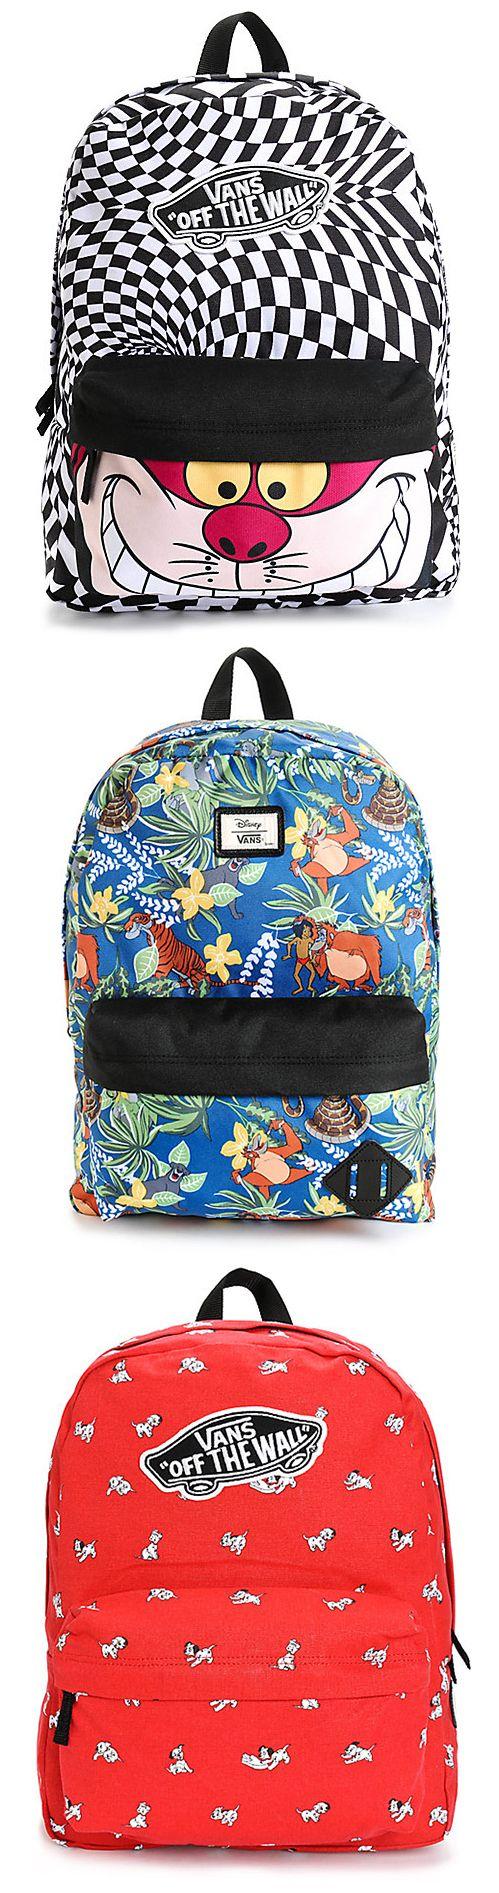 New Disney x Vans backpacks are here!